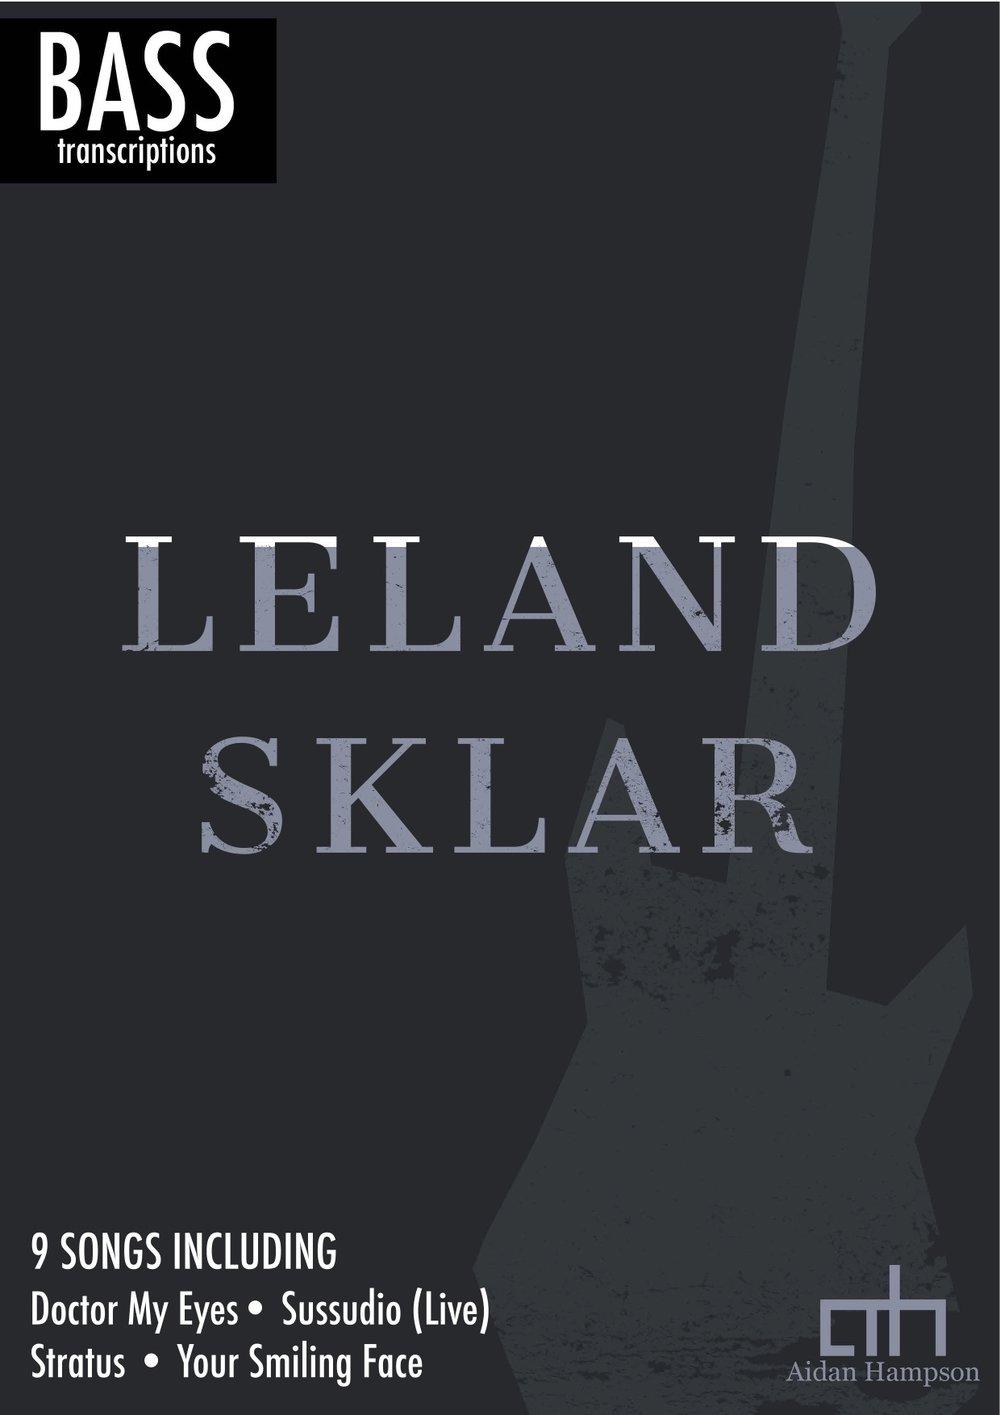 Leland Sklar - Bass.jpg